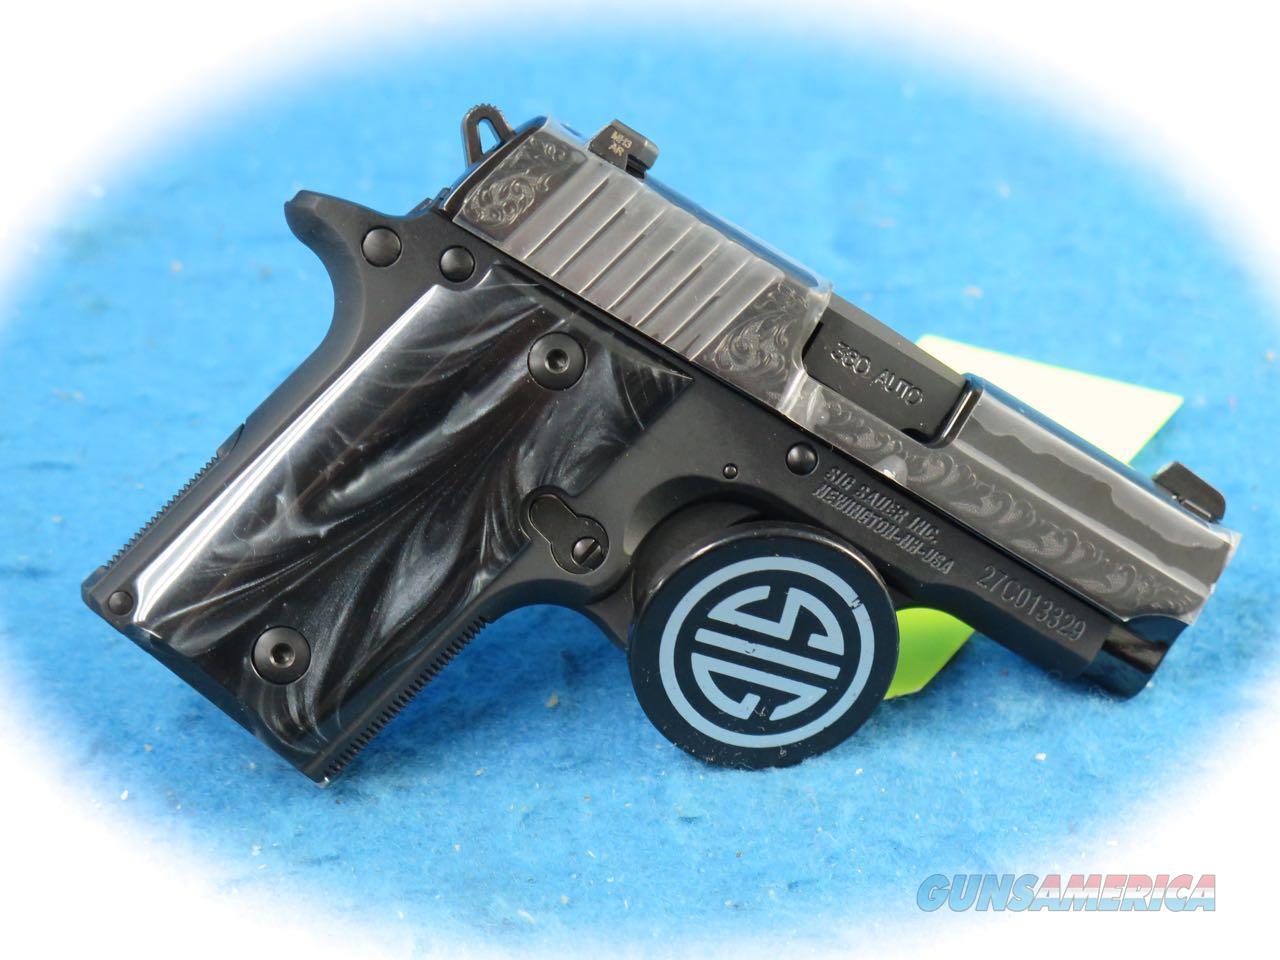 Sig Sauer P238 Engraved Black Pearl .380 ACP Pistol **New**  Guns > Pistols > Sig - Sauer/Sigarms Pistols > P238